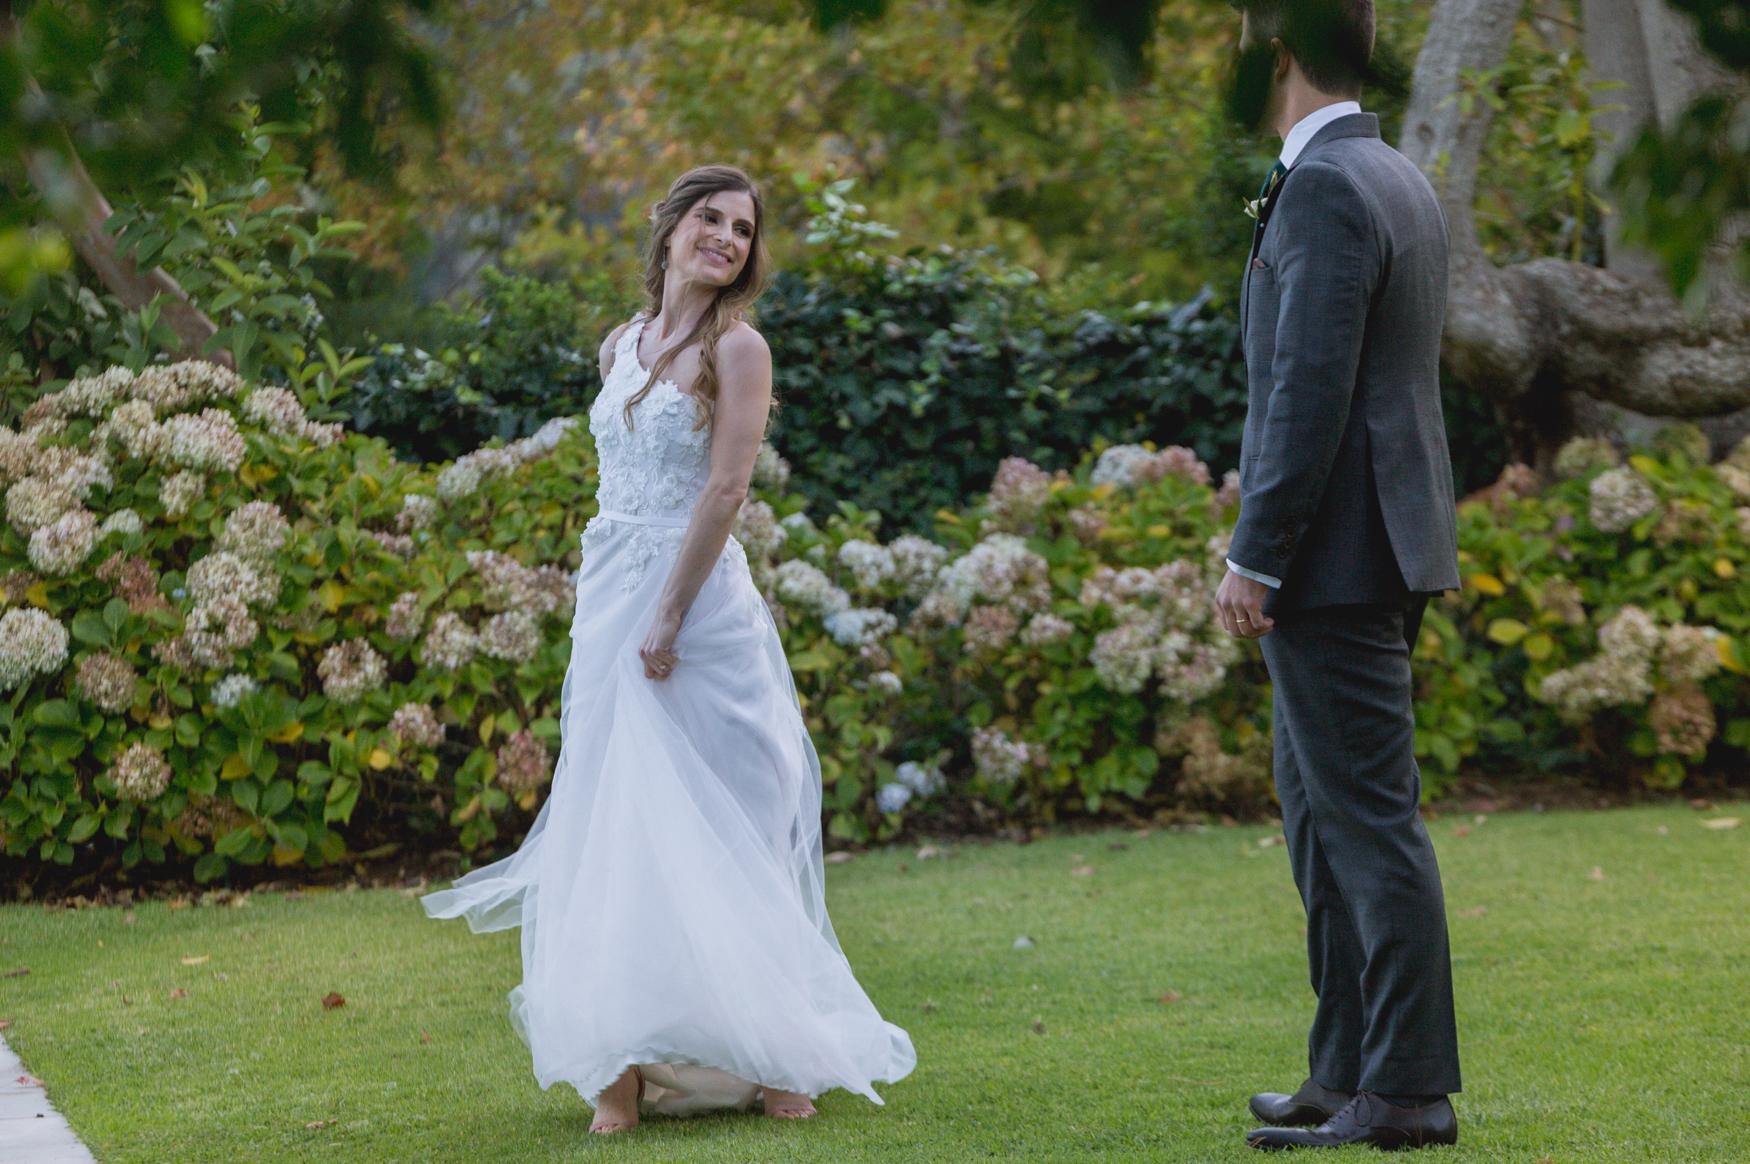 Leon_&_Martine's_Wedding_Photographs_17th_April_2019_@johnhenryweddingphoto_Low_Resolution_Web-424.JPG